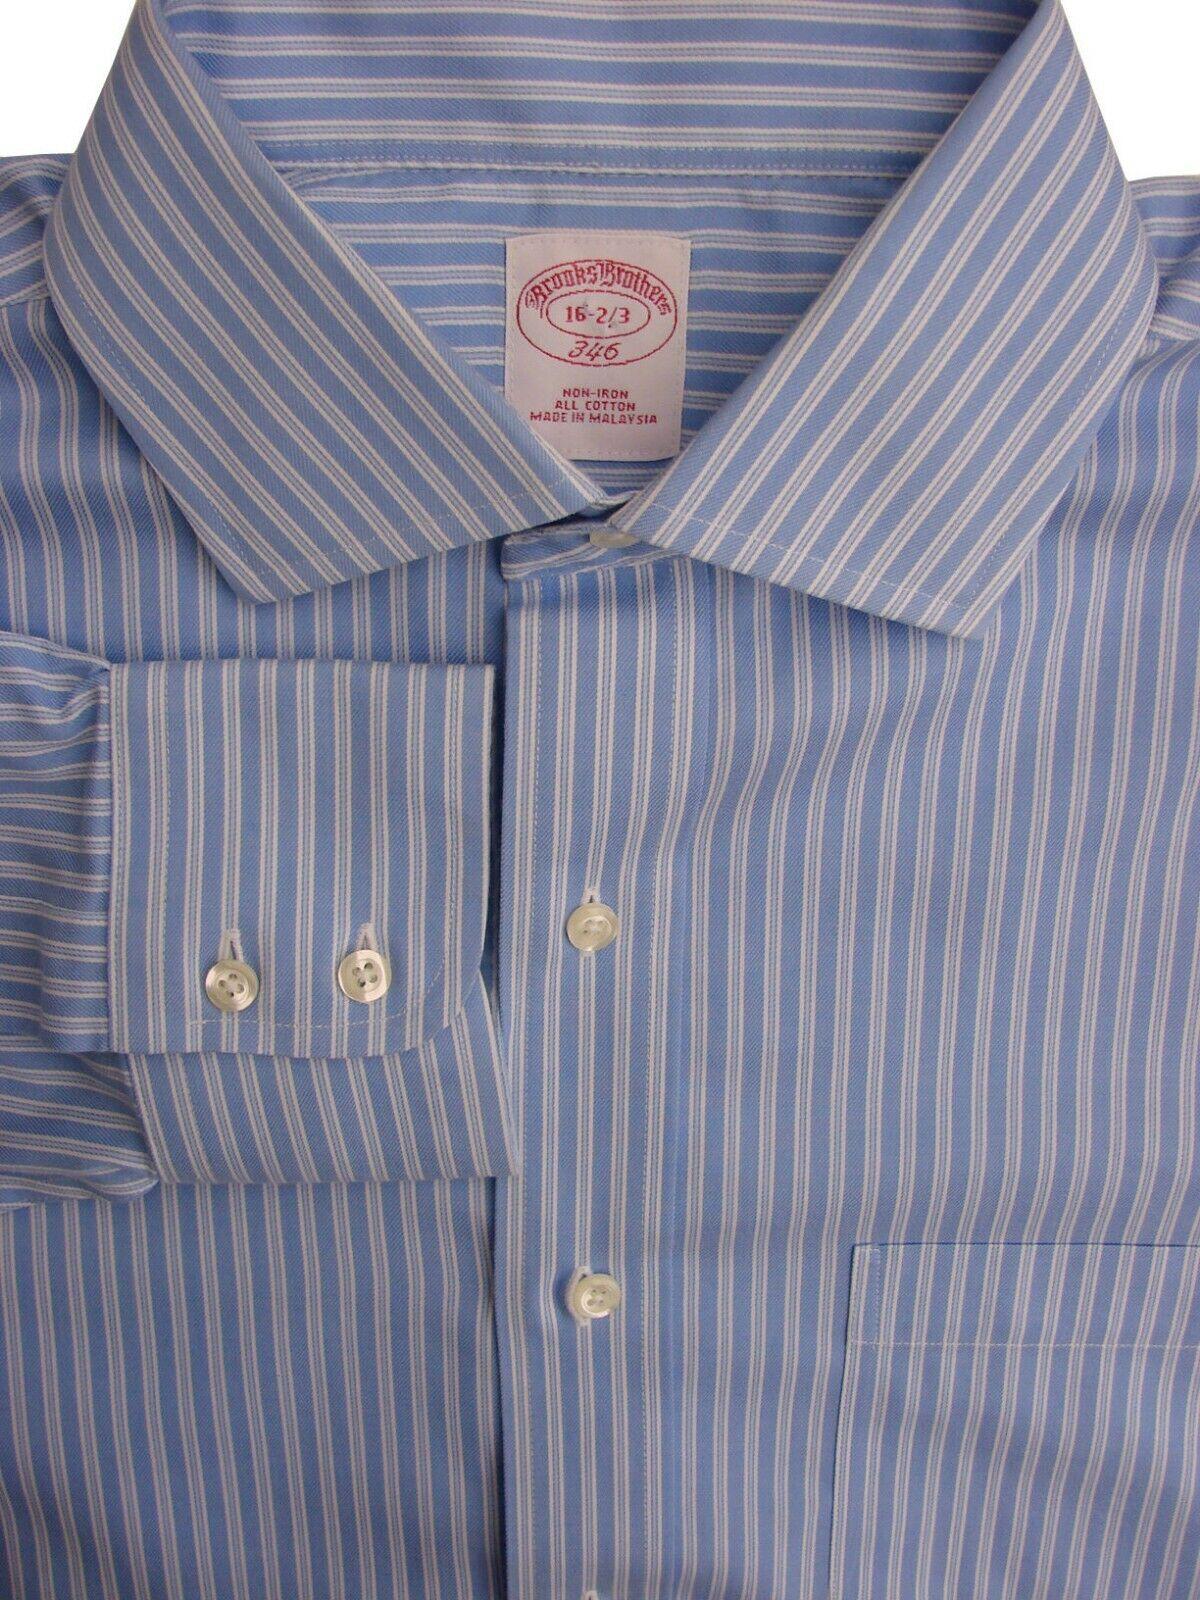 Brooks Brothers 346 Camicia Da Uomo 16 M STRISCE BLU-BIANCO SENZA FERRO